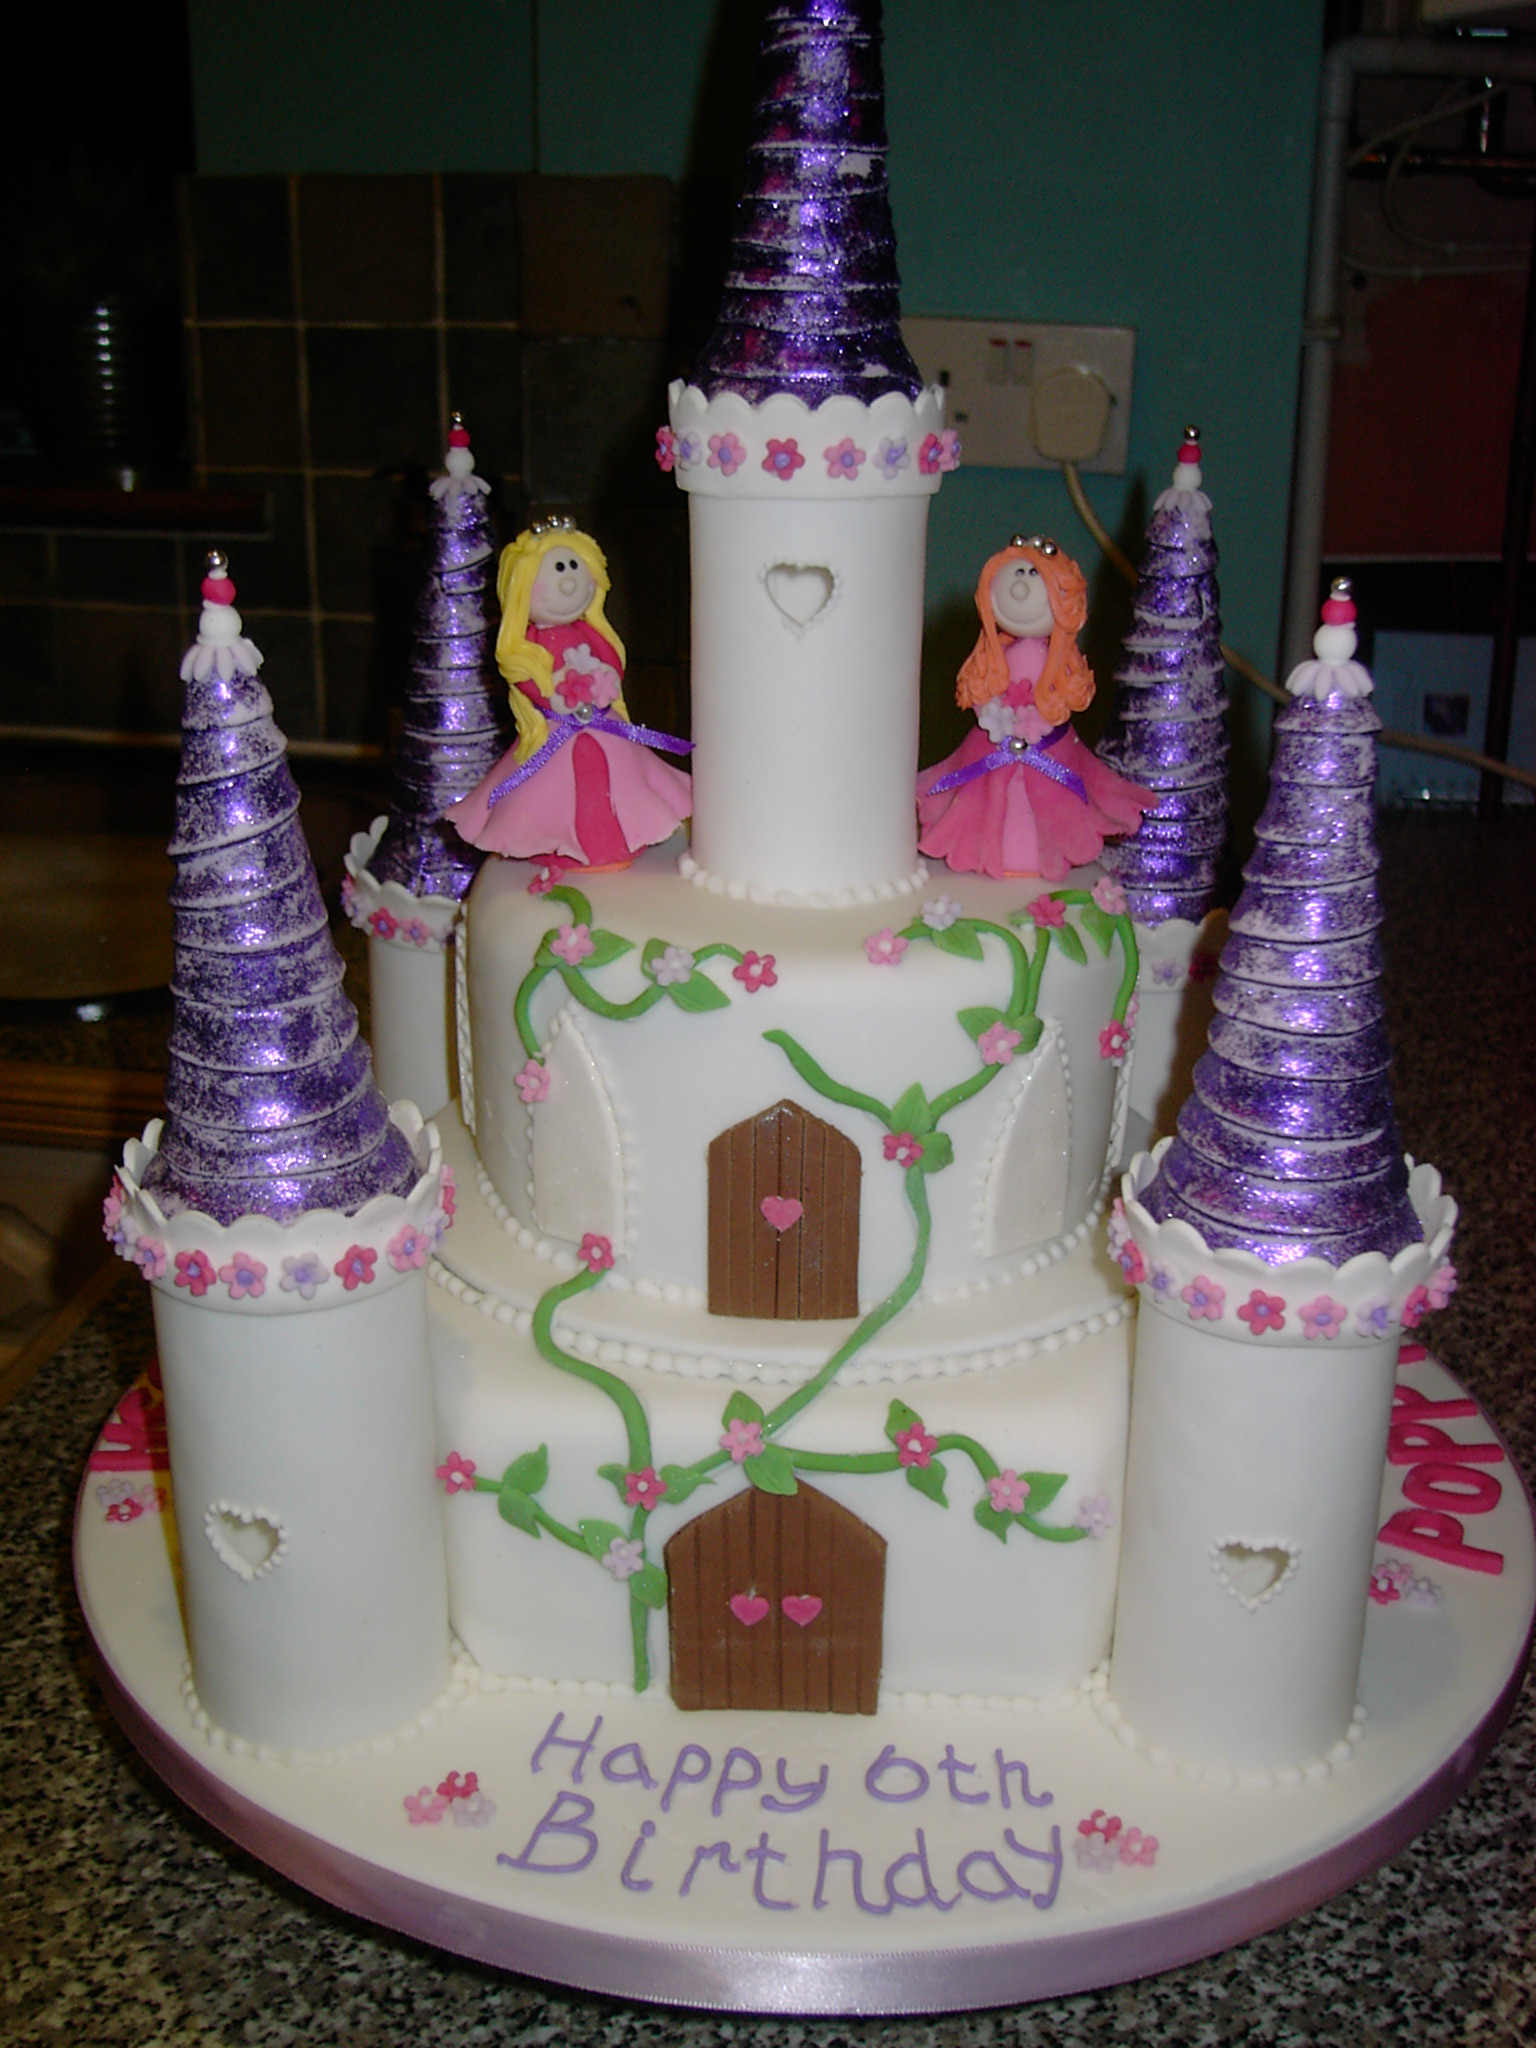 Ough What a Cake 1 Birthdays